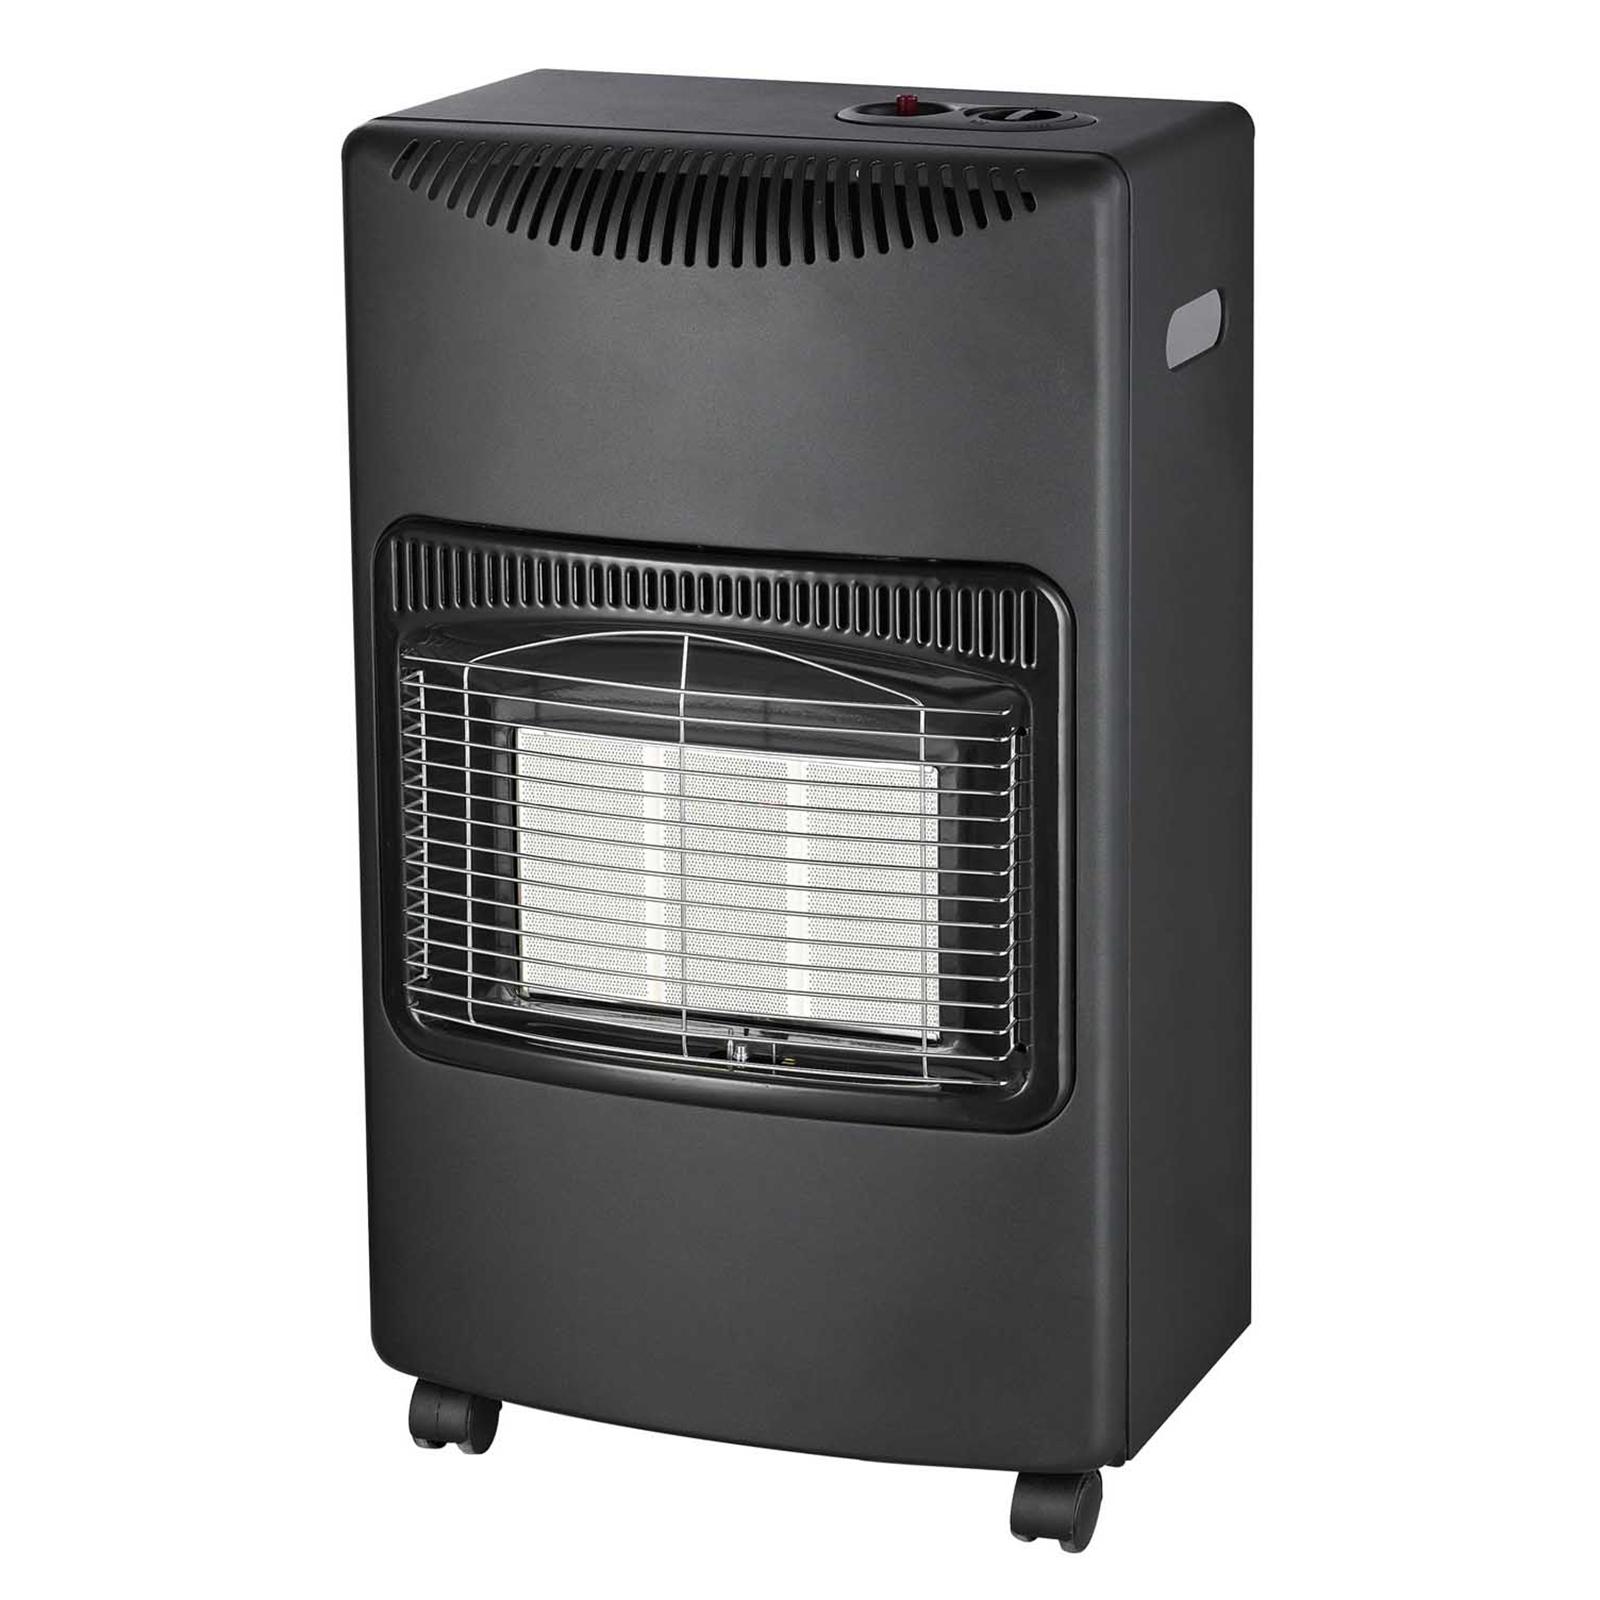 New 4.2Kw Portable Home Butane Fire Calor Gas Cabinet ...